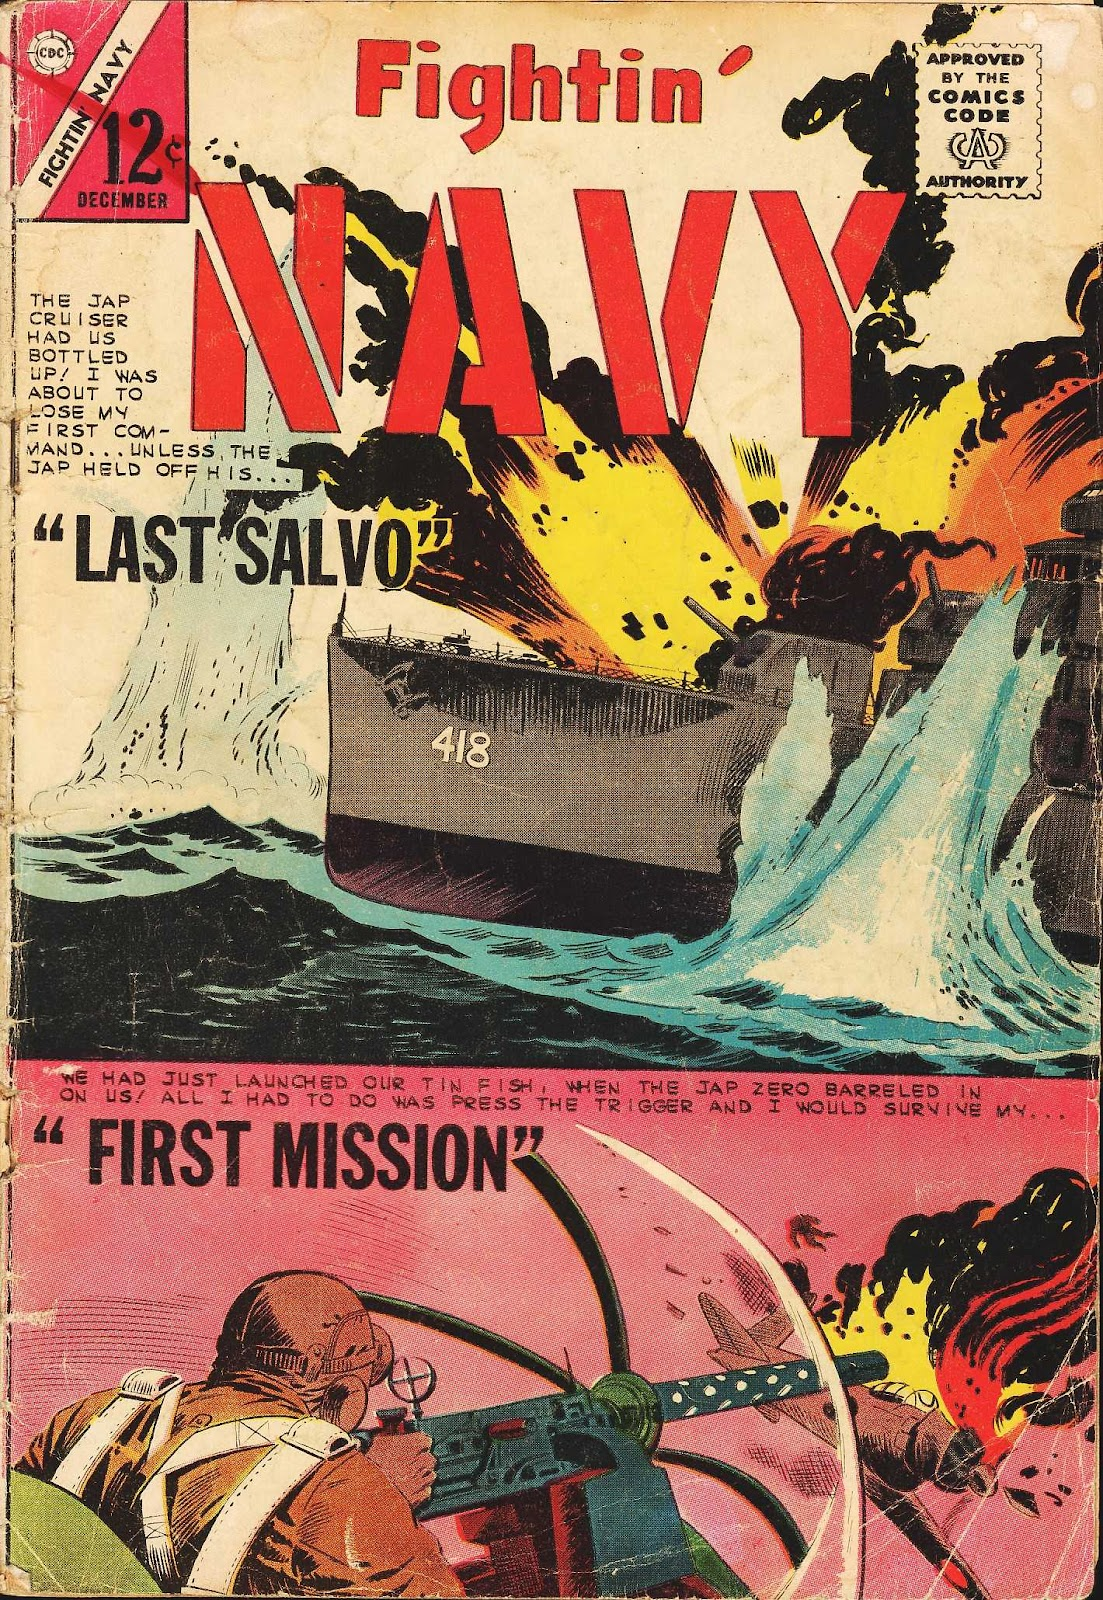 Read online Fightin' Navy comic -  Issue #113 - 1